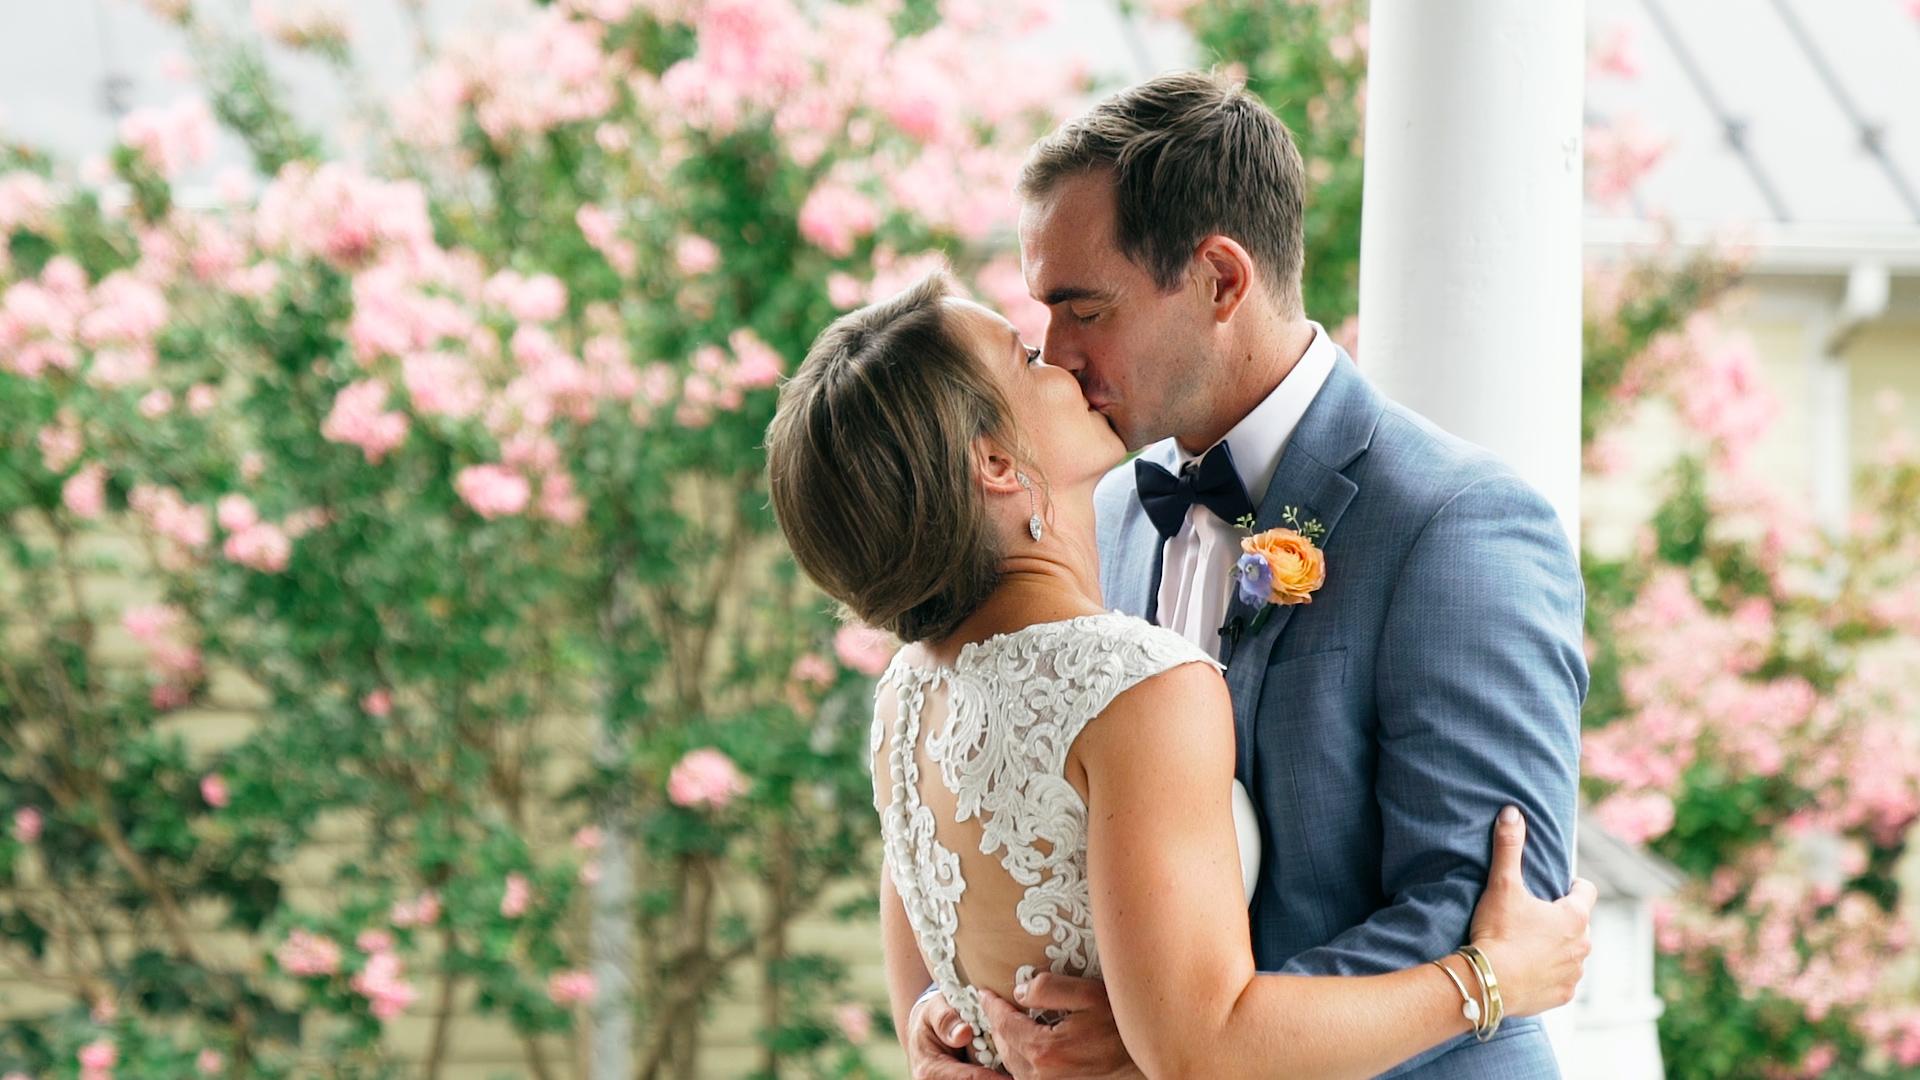 Bride and Groom kissing in garden